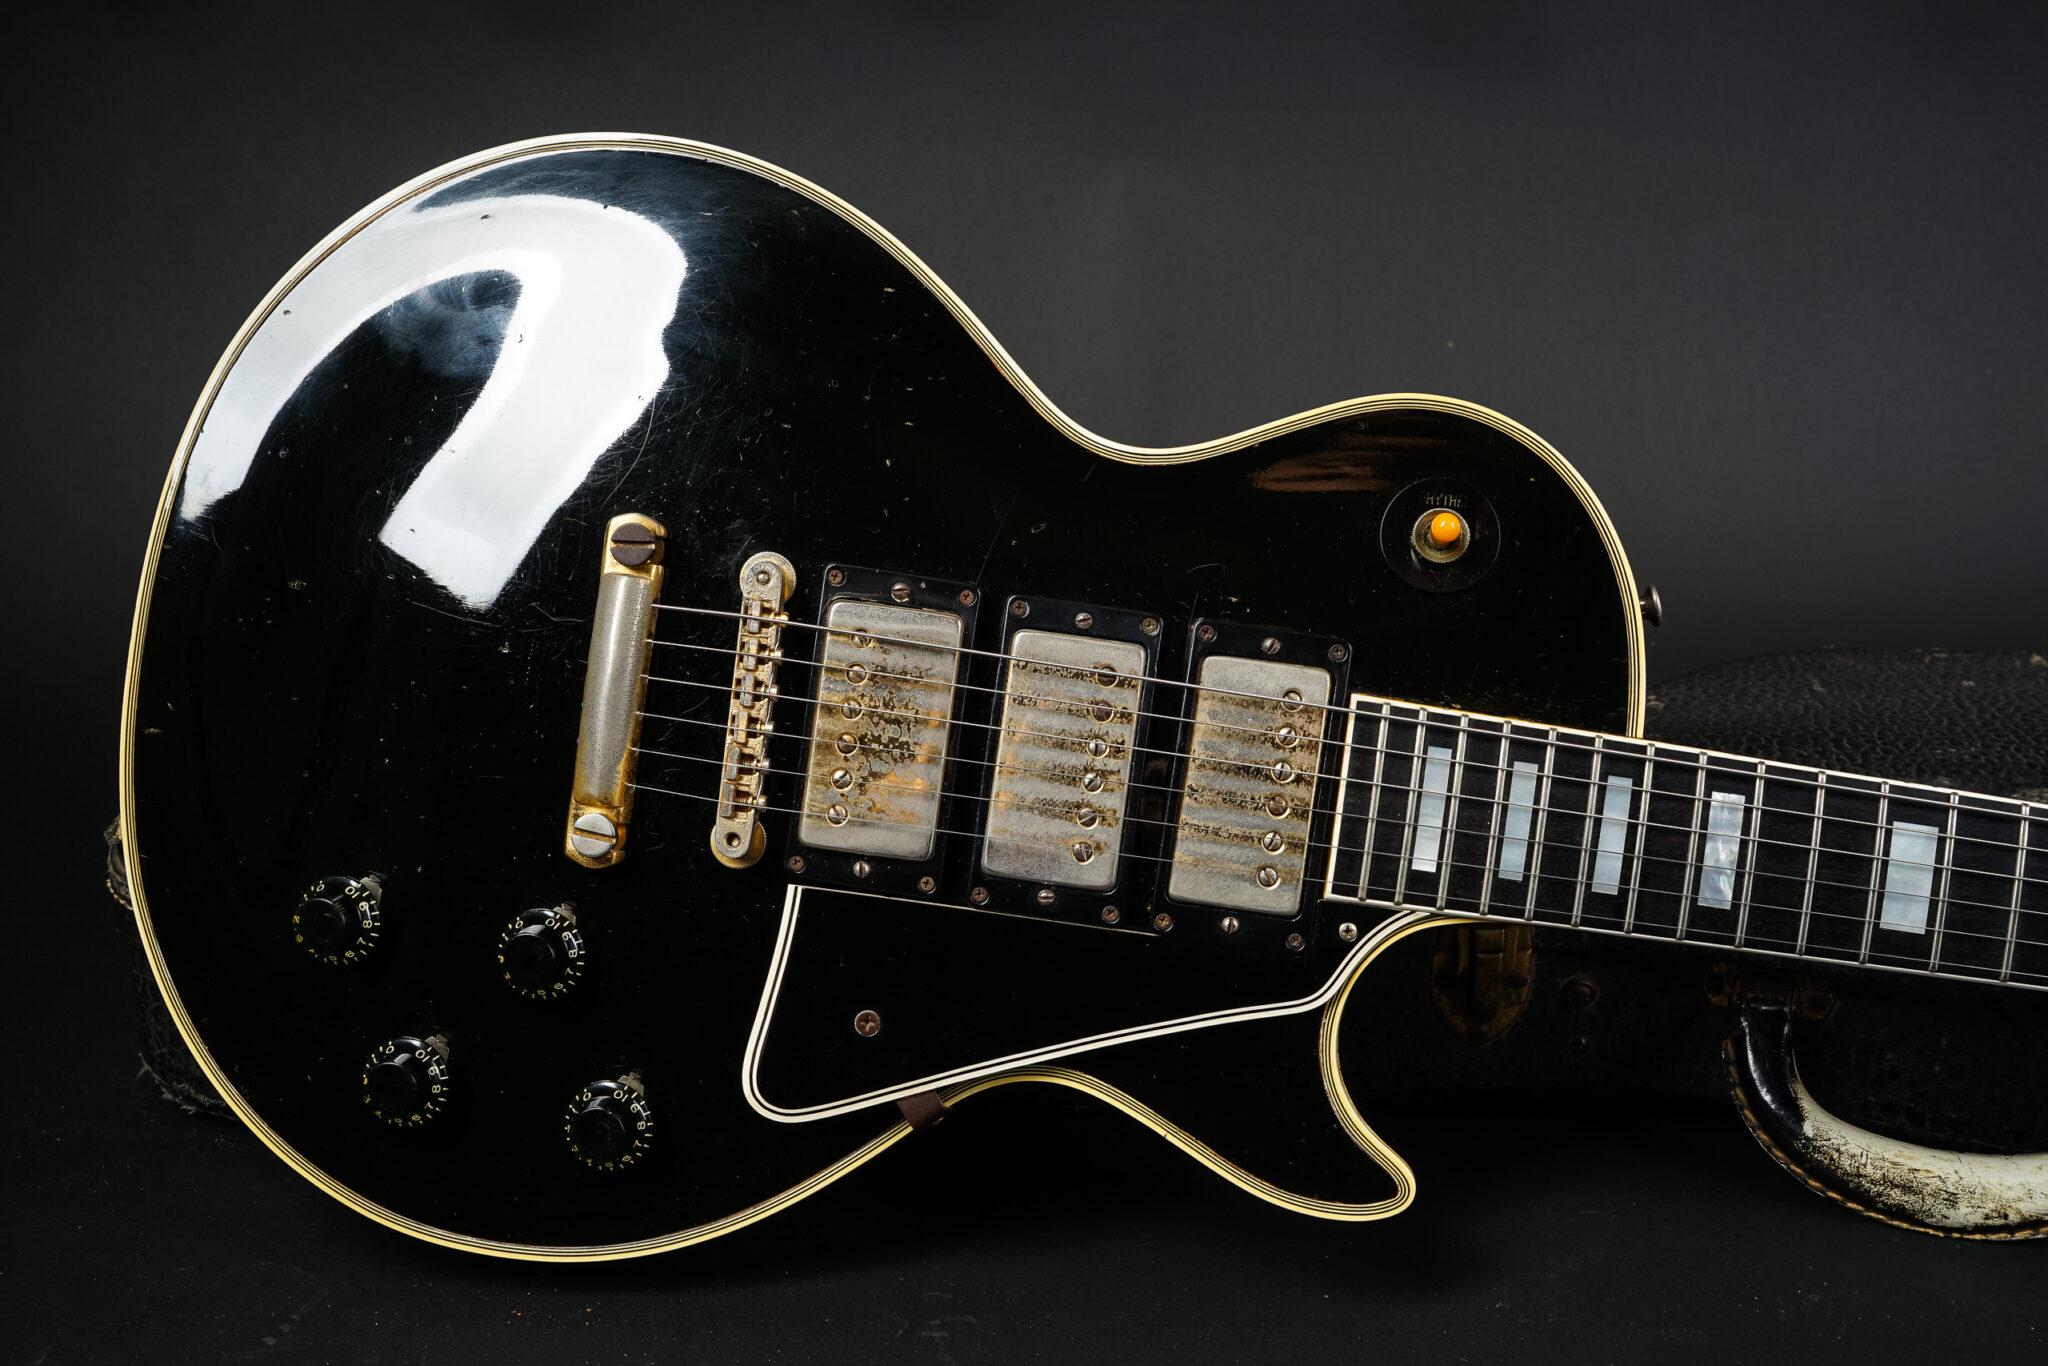 https://guitarpoint.de/app/uploads/products/1959-gibson-les-paul-custom-black-beauty/1959-Gibson-Les-Paul-Custom-Ebony-91722-10-2048x1366.jpg